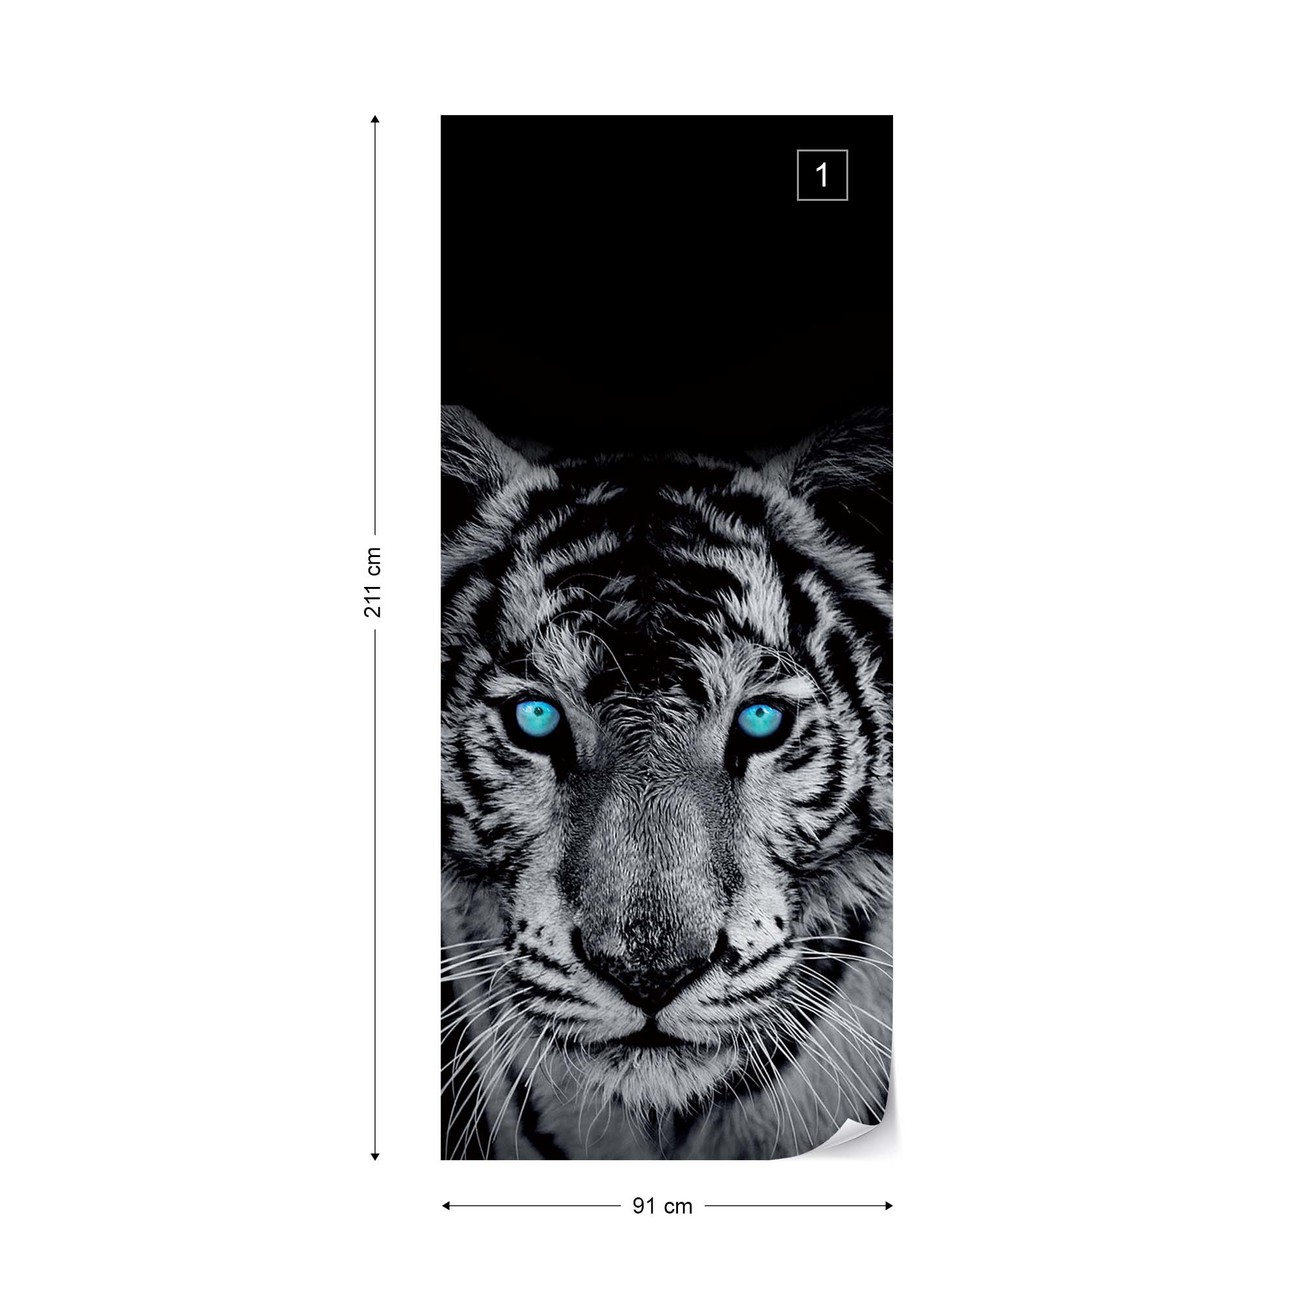 Photo Wallpaper Mural Non-woven 10202/_VE Tiger Tiger Animal Blue Eyes Wildness G